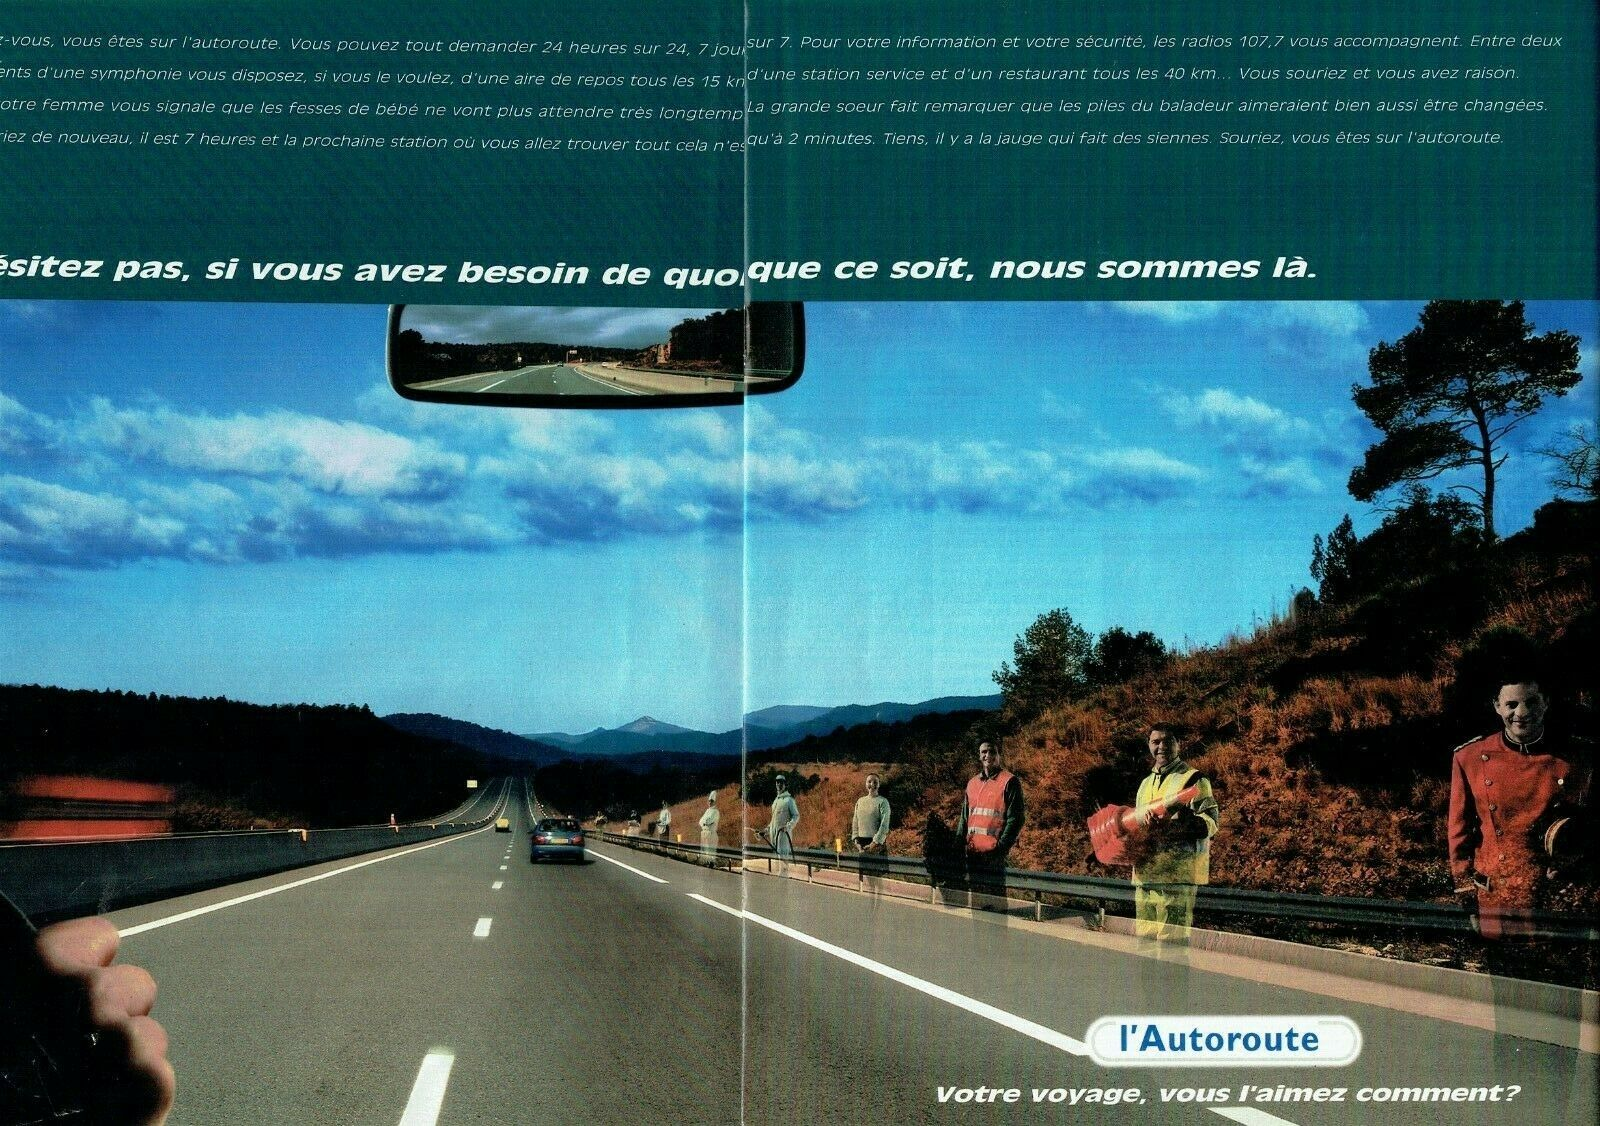 1998 l'Autoroute 24 h -24 h